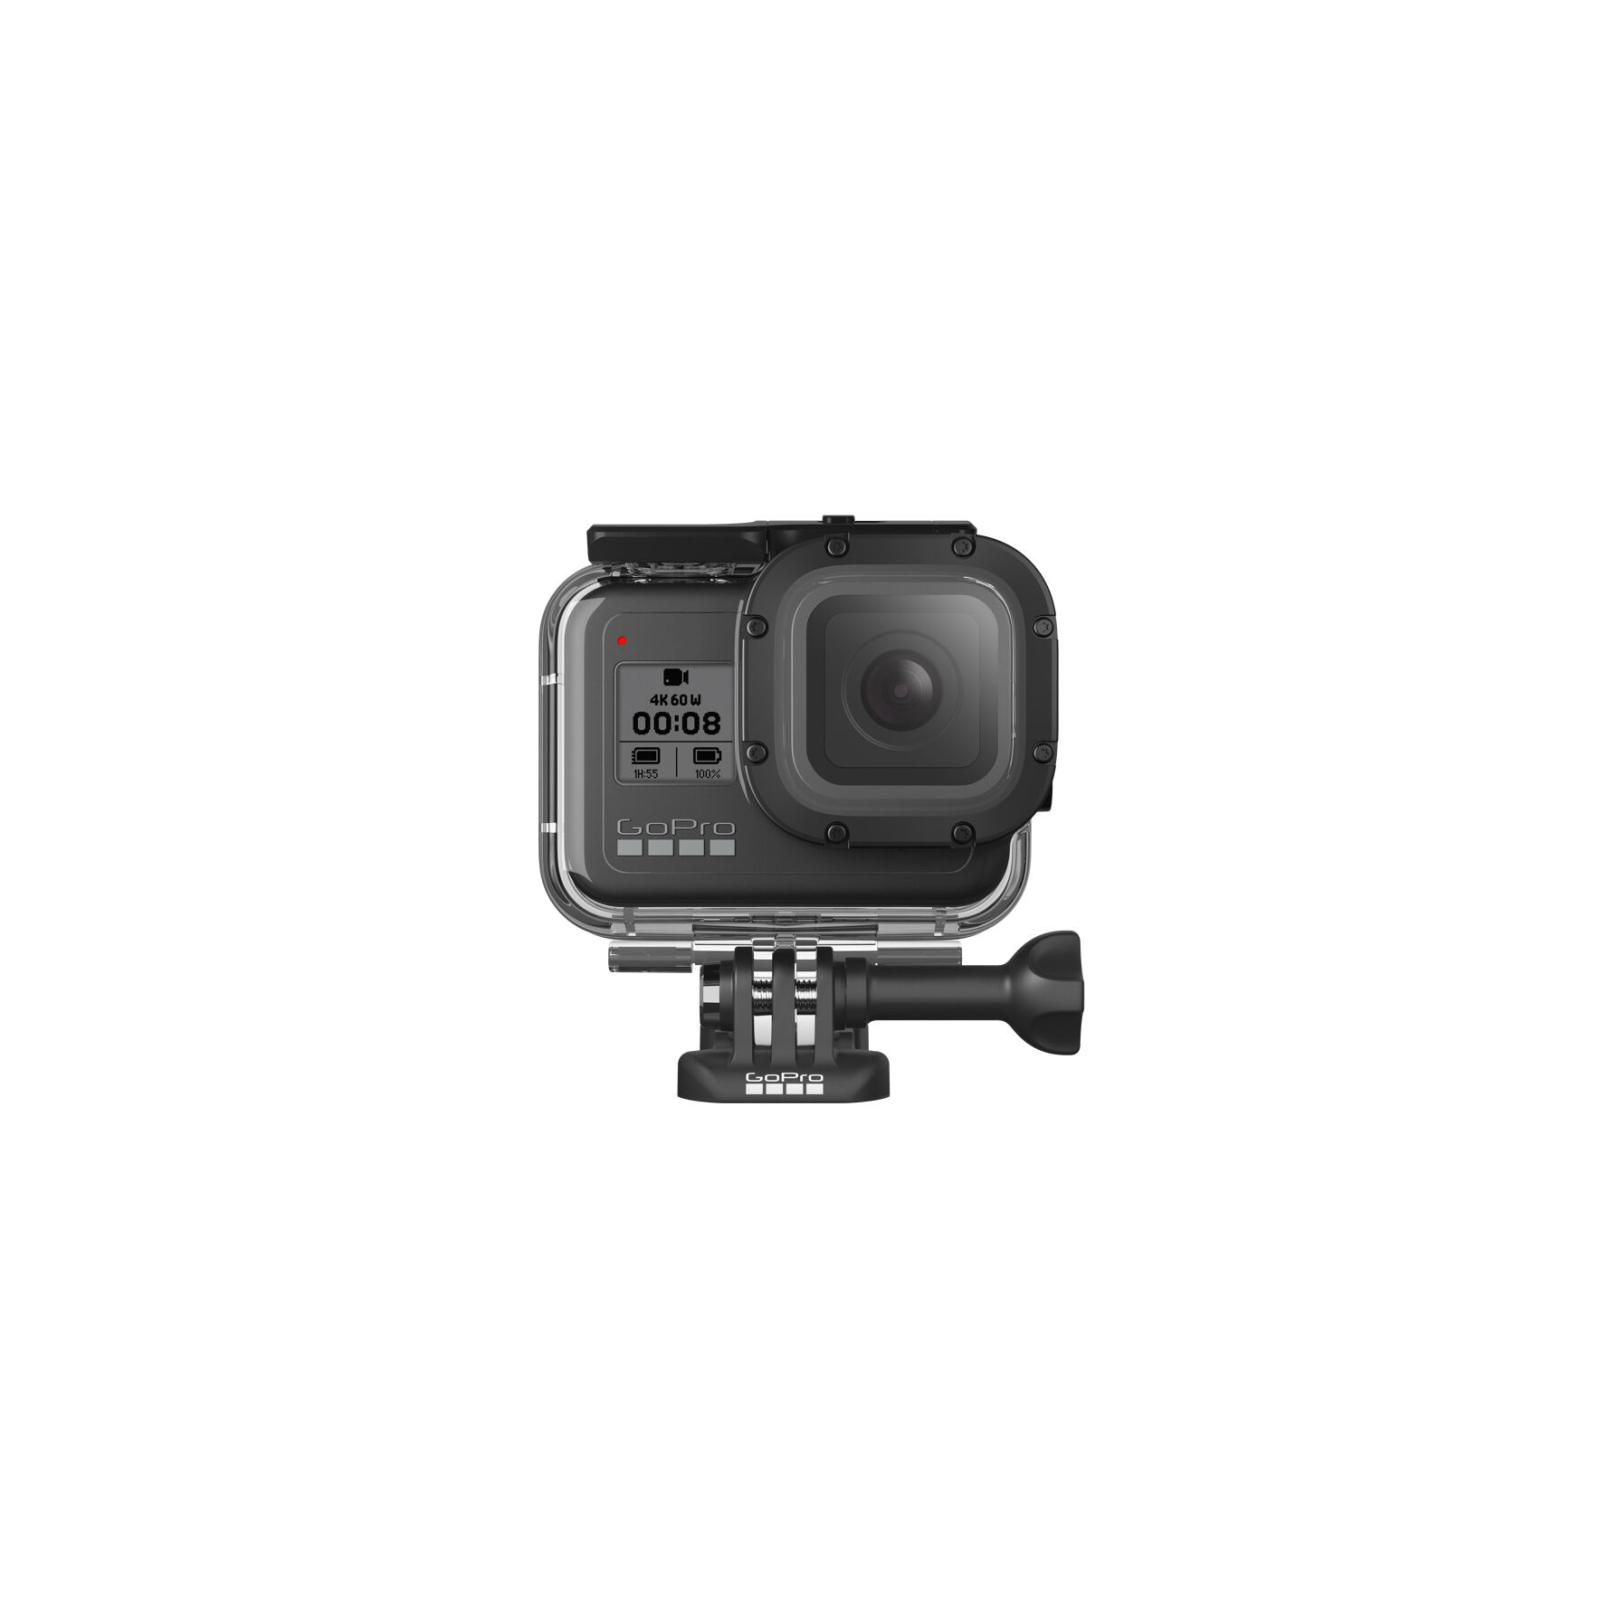 Аксессуар к экшн-камерам GoPro Super Suit Dive Housing forHERO8 Black (AJDIV-001) изображение 3